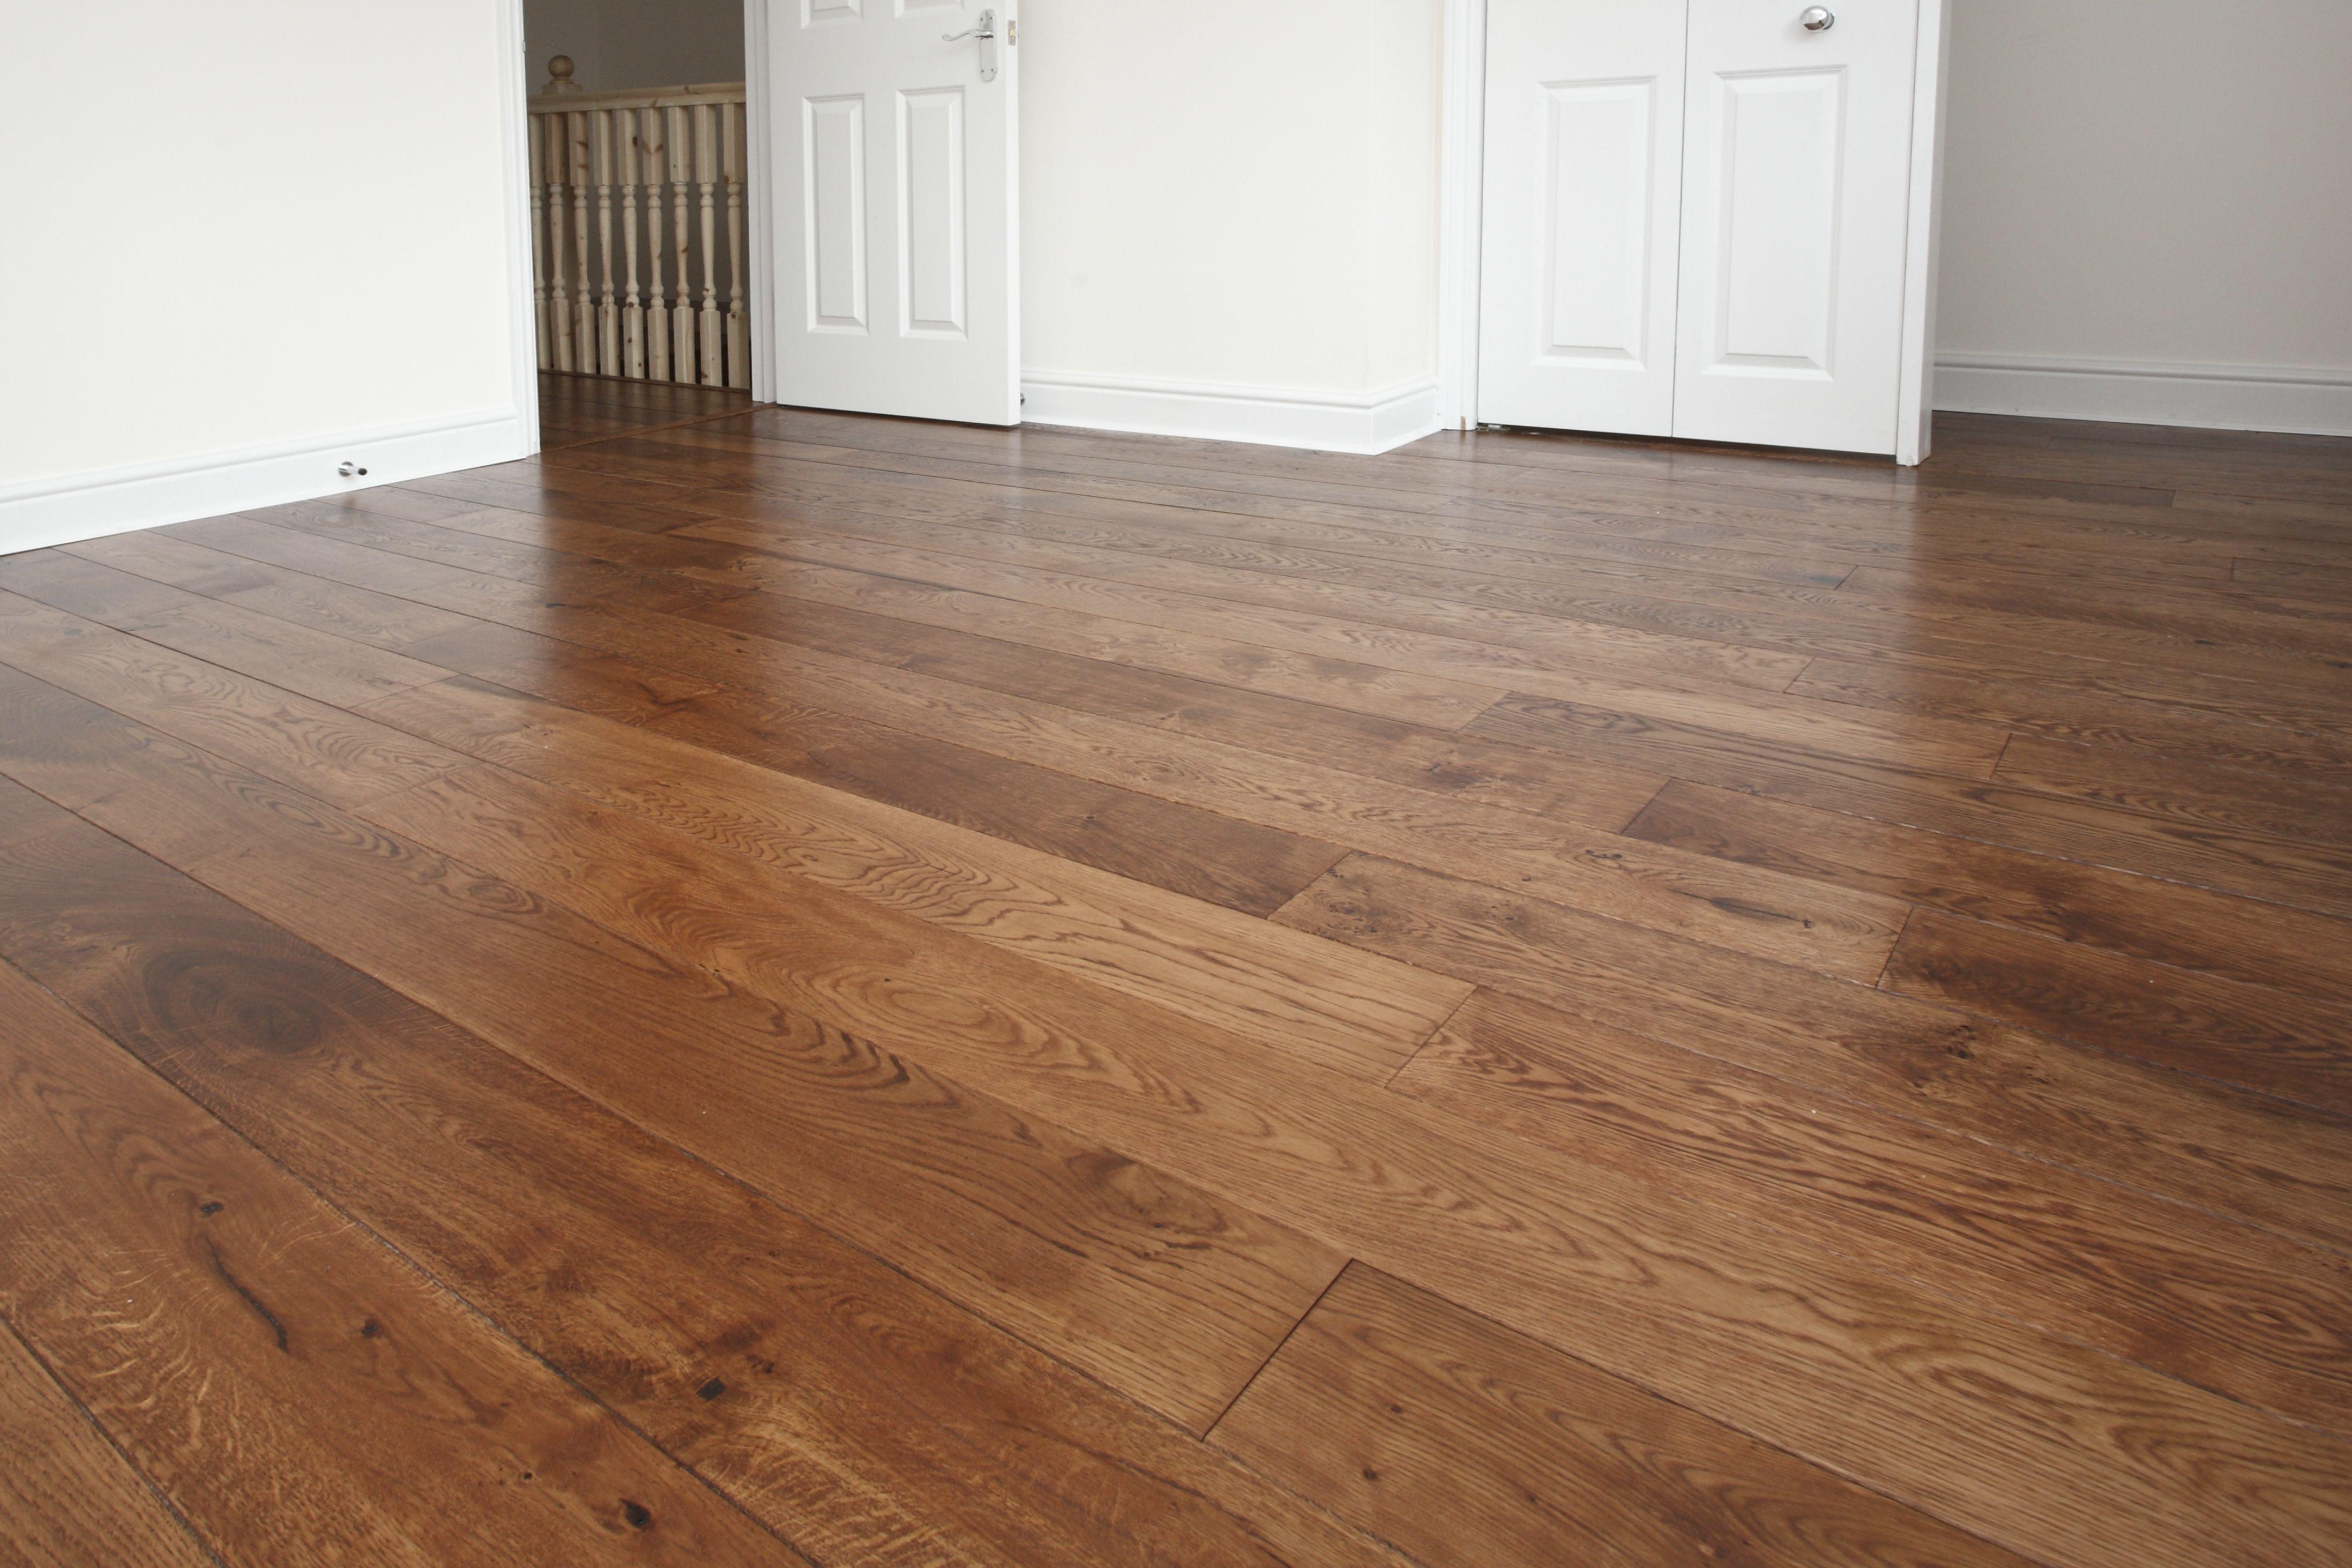 Oak Rustic Grade Engineered Flooring UK Wood Floors